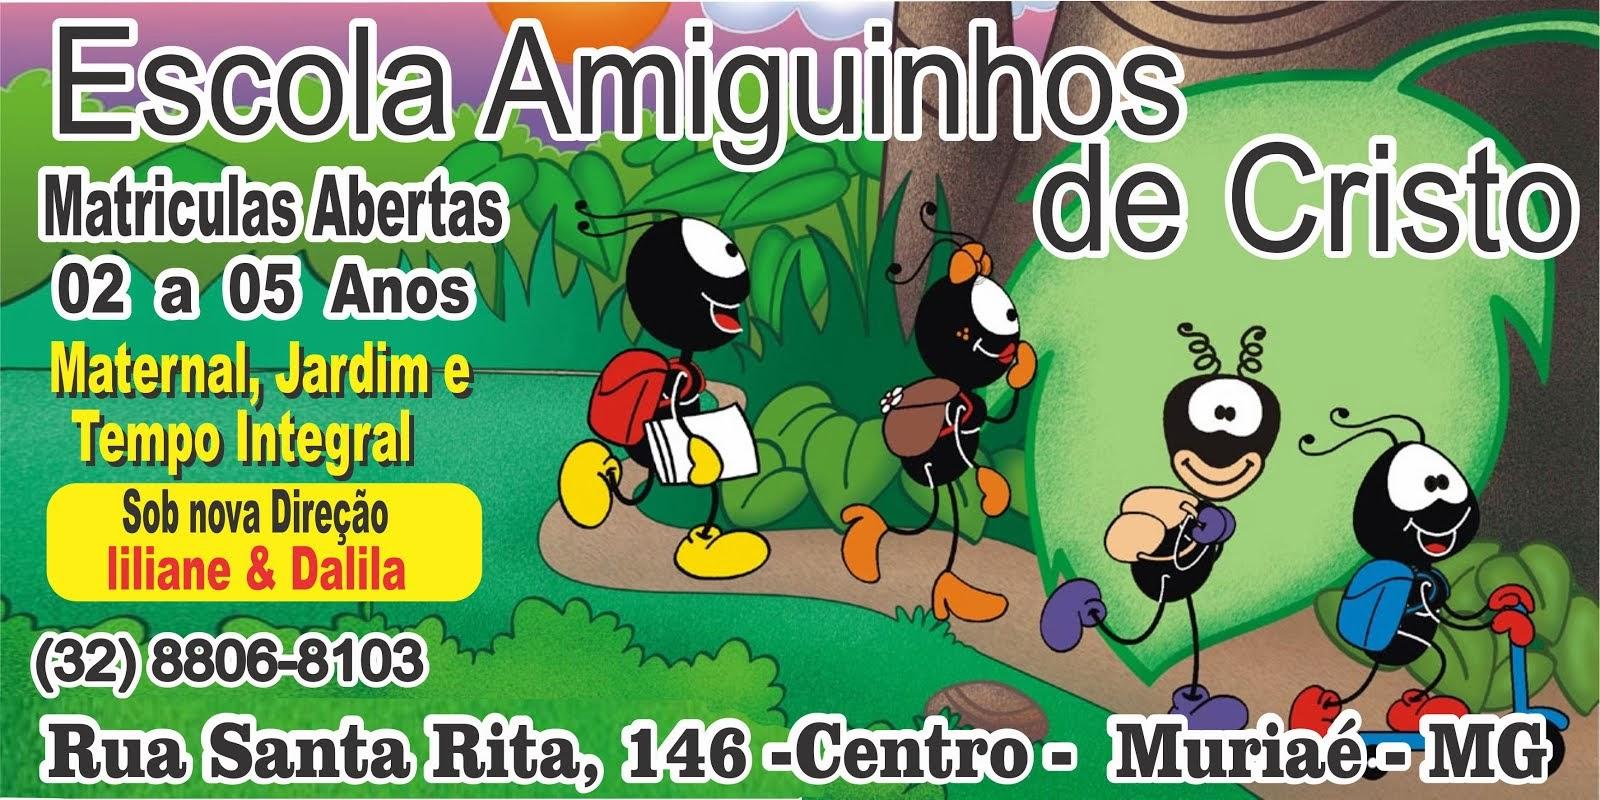 AMIGUINHOS DE CRISTO